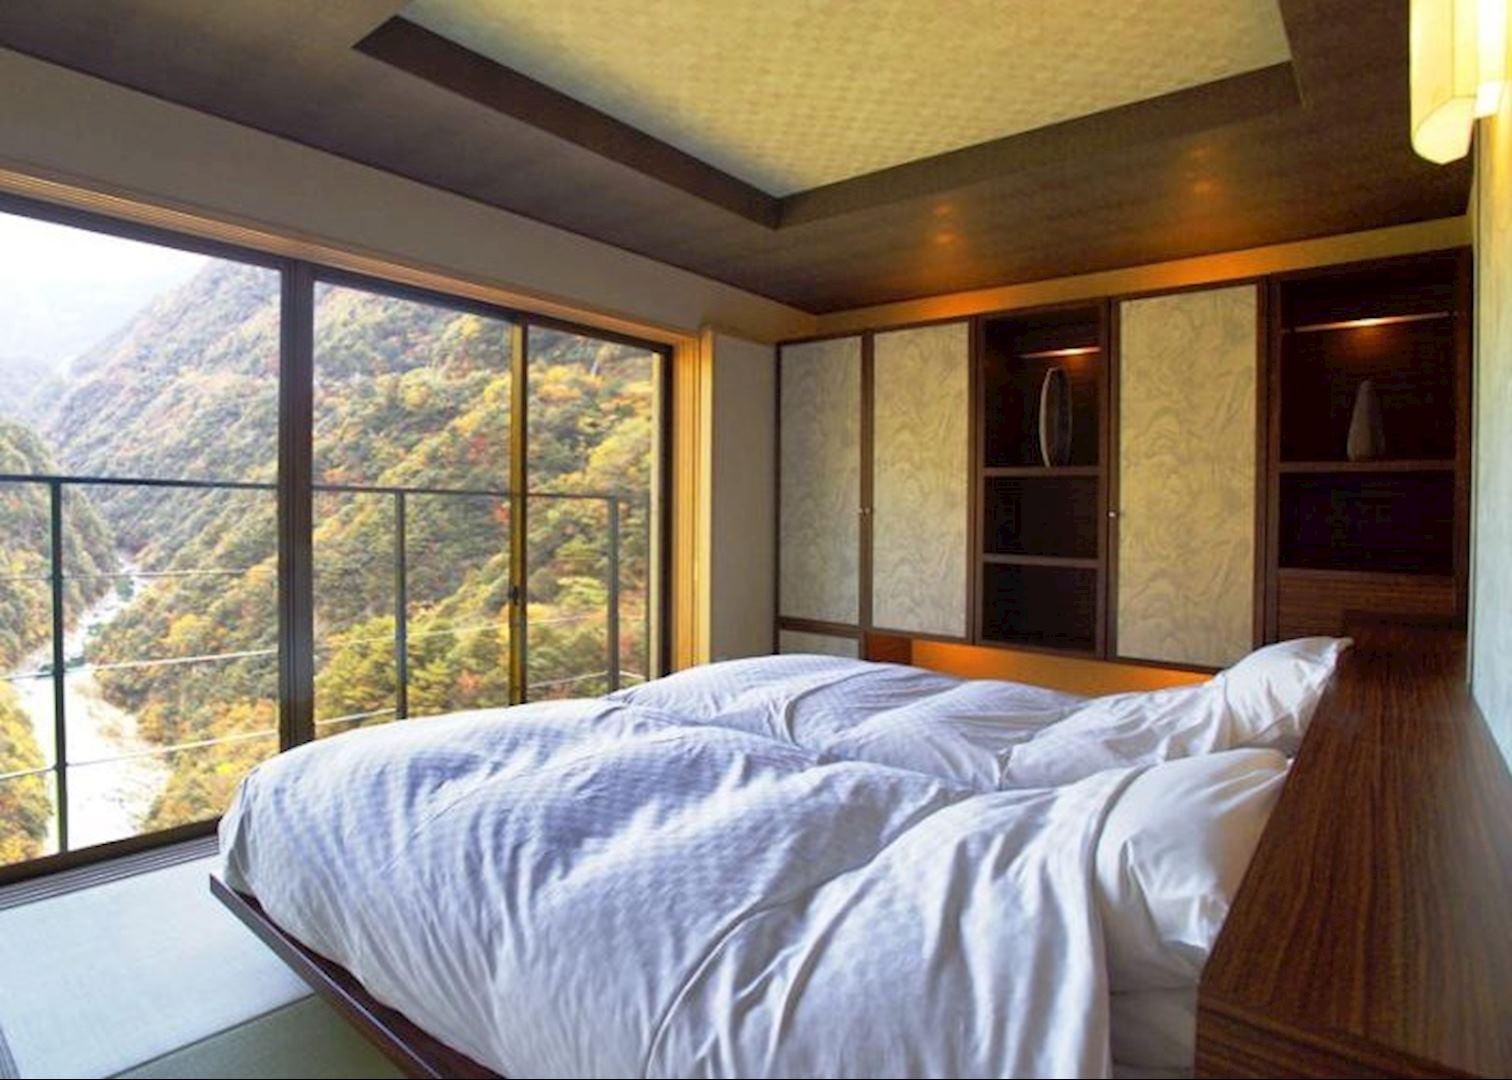 Iya Valley Onsen Hotel Hotels In Iya Valley Audley Travel